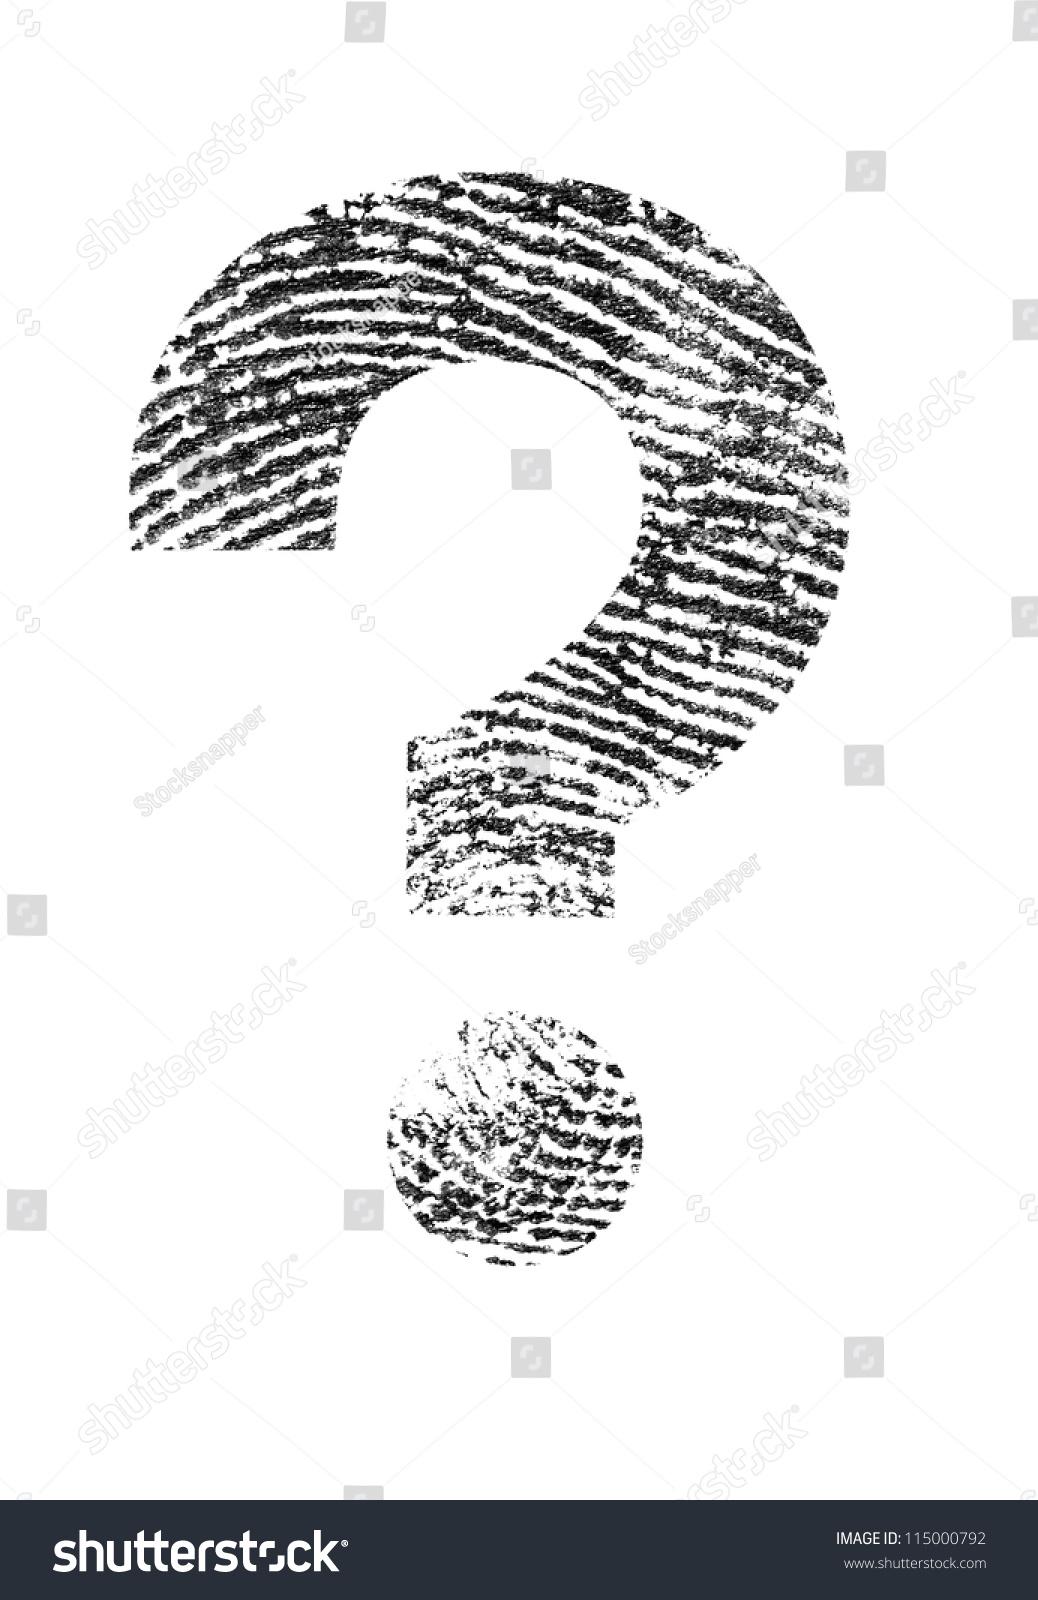 research paper on fingerprints